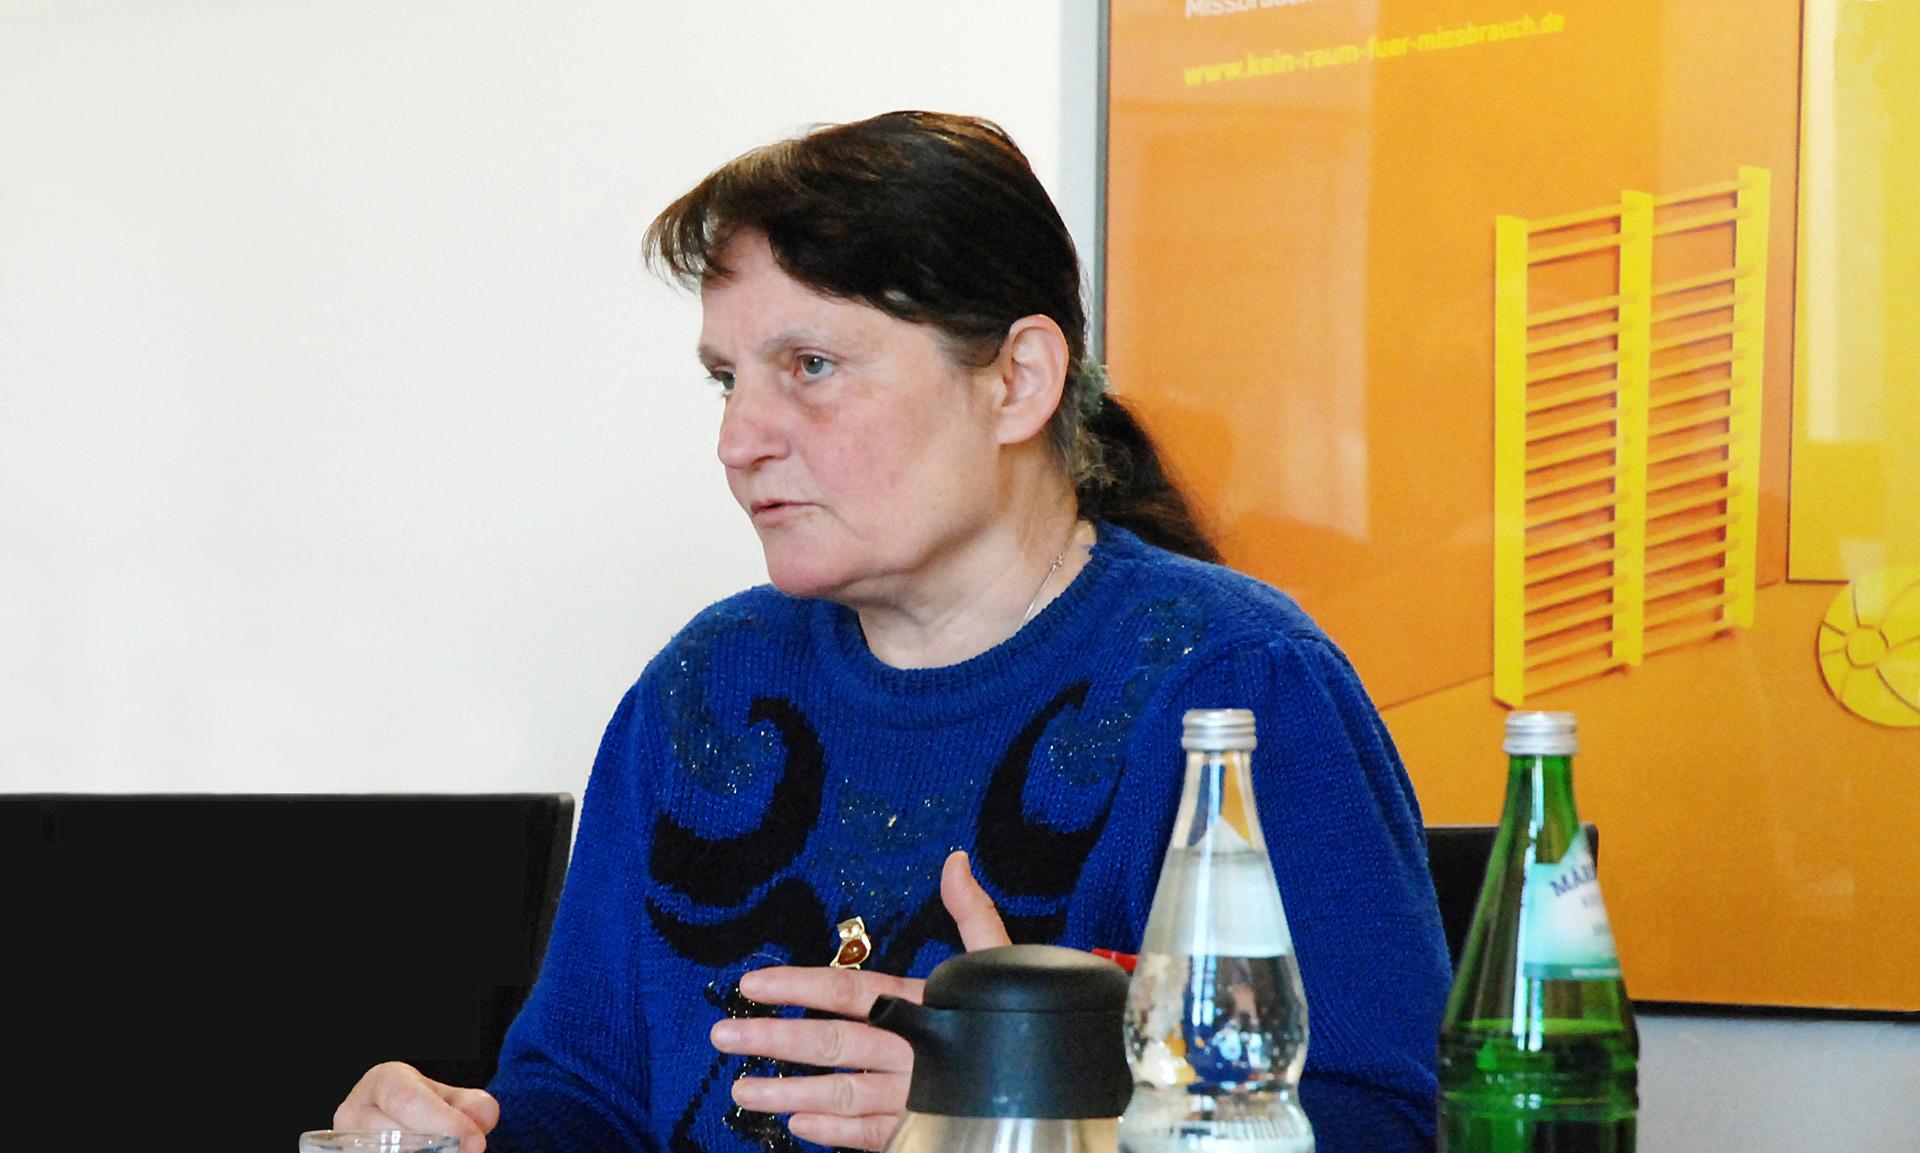 Prof. Dr. Adelheid Herrmann-Pfandt